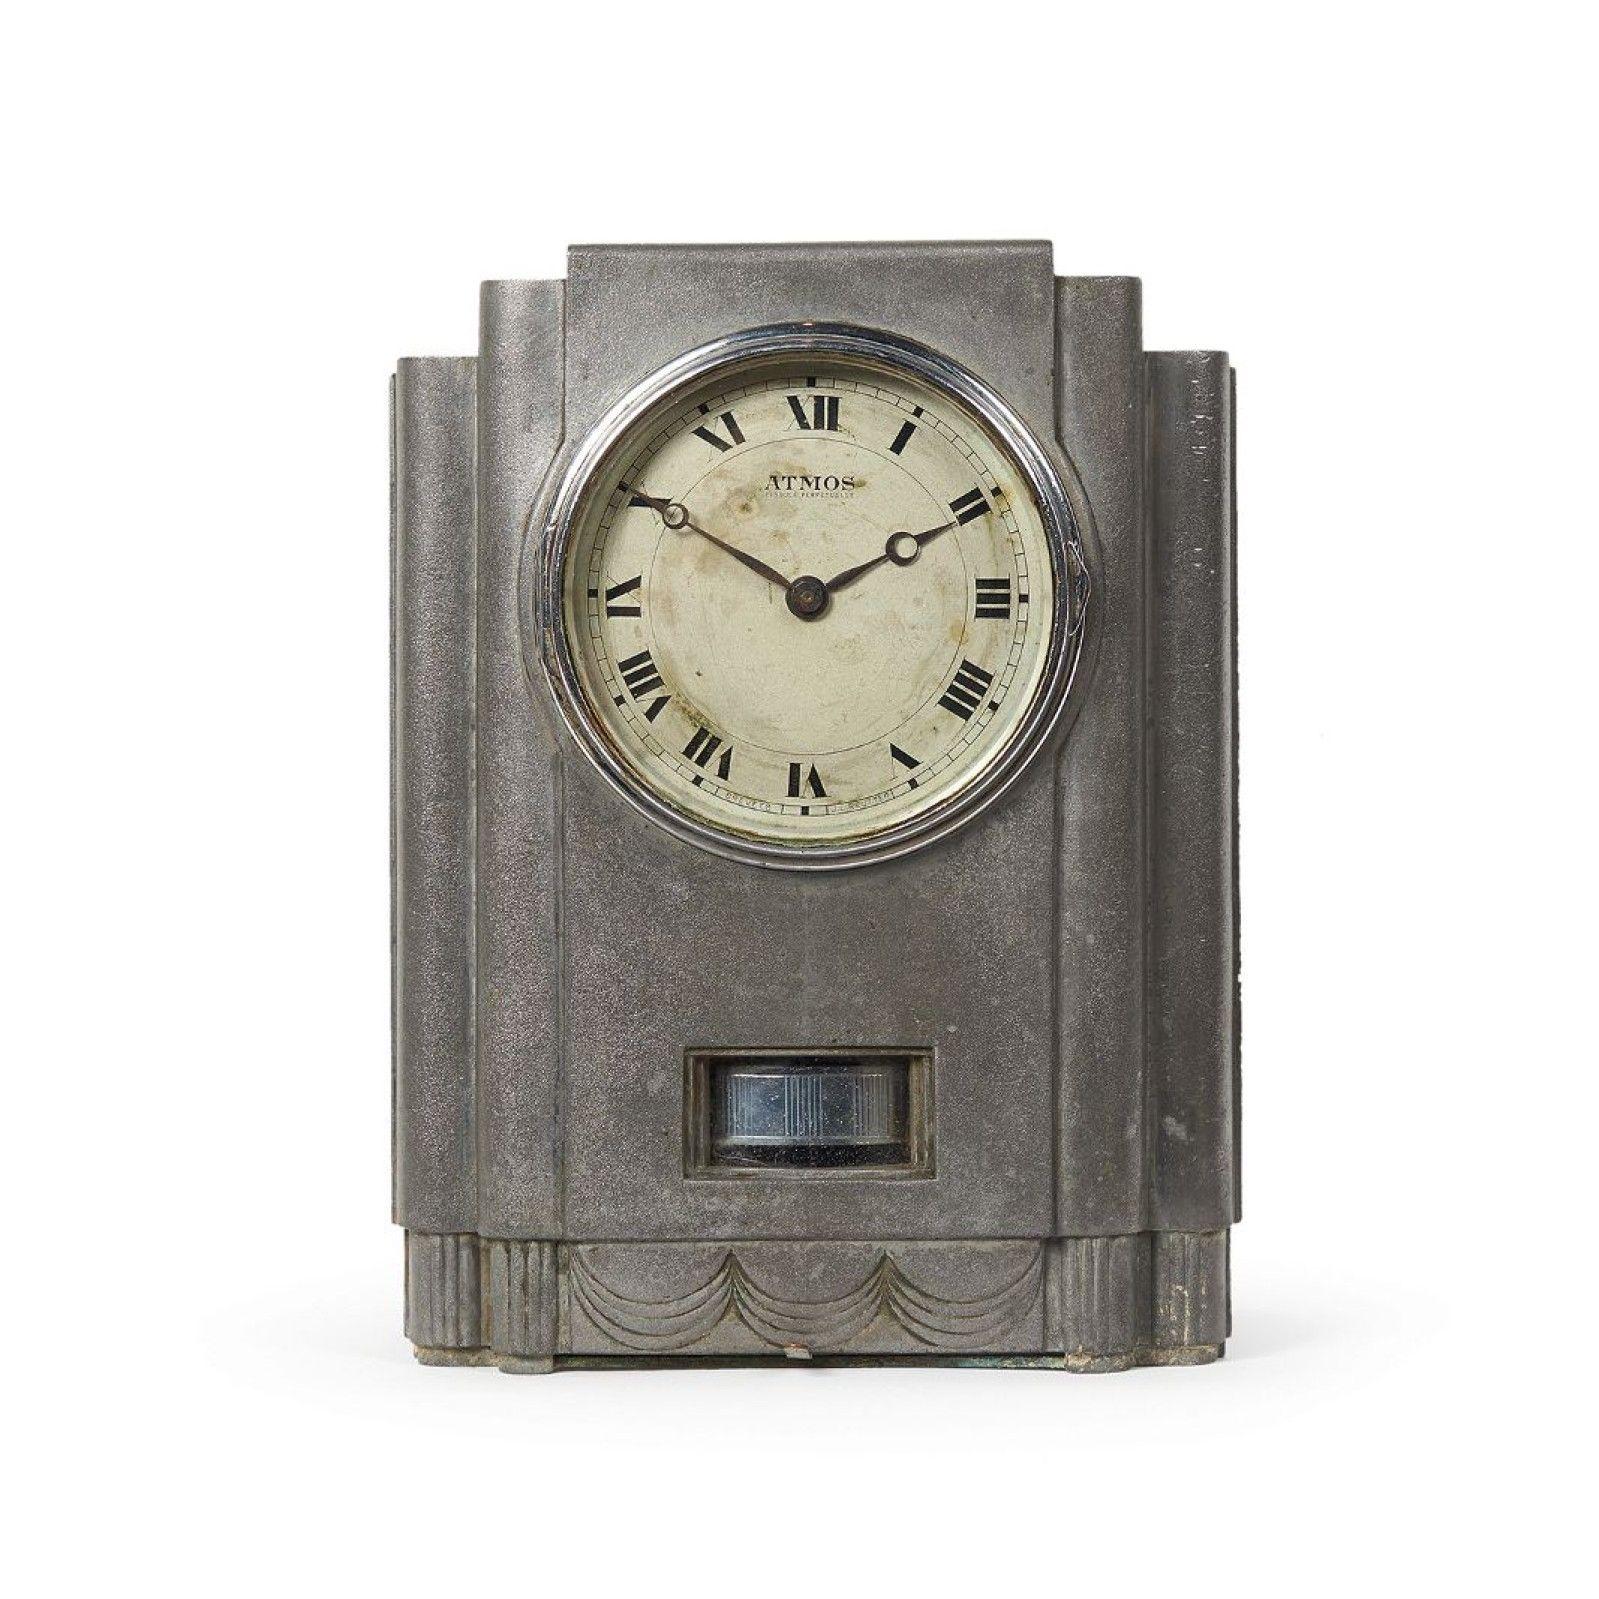 Horloge De Bureau Originale j.l. reutter; #fj1 nickeled steel atmos 'juke box' clock for